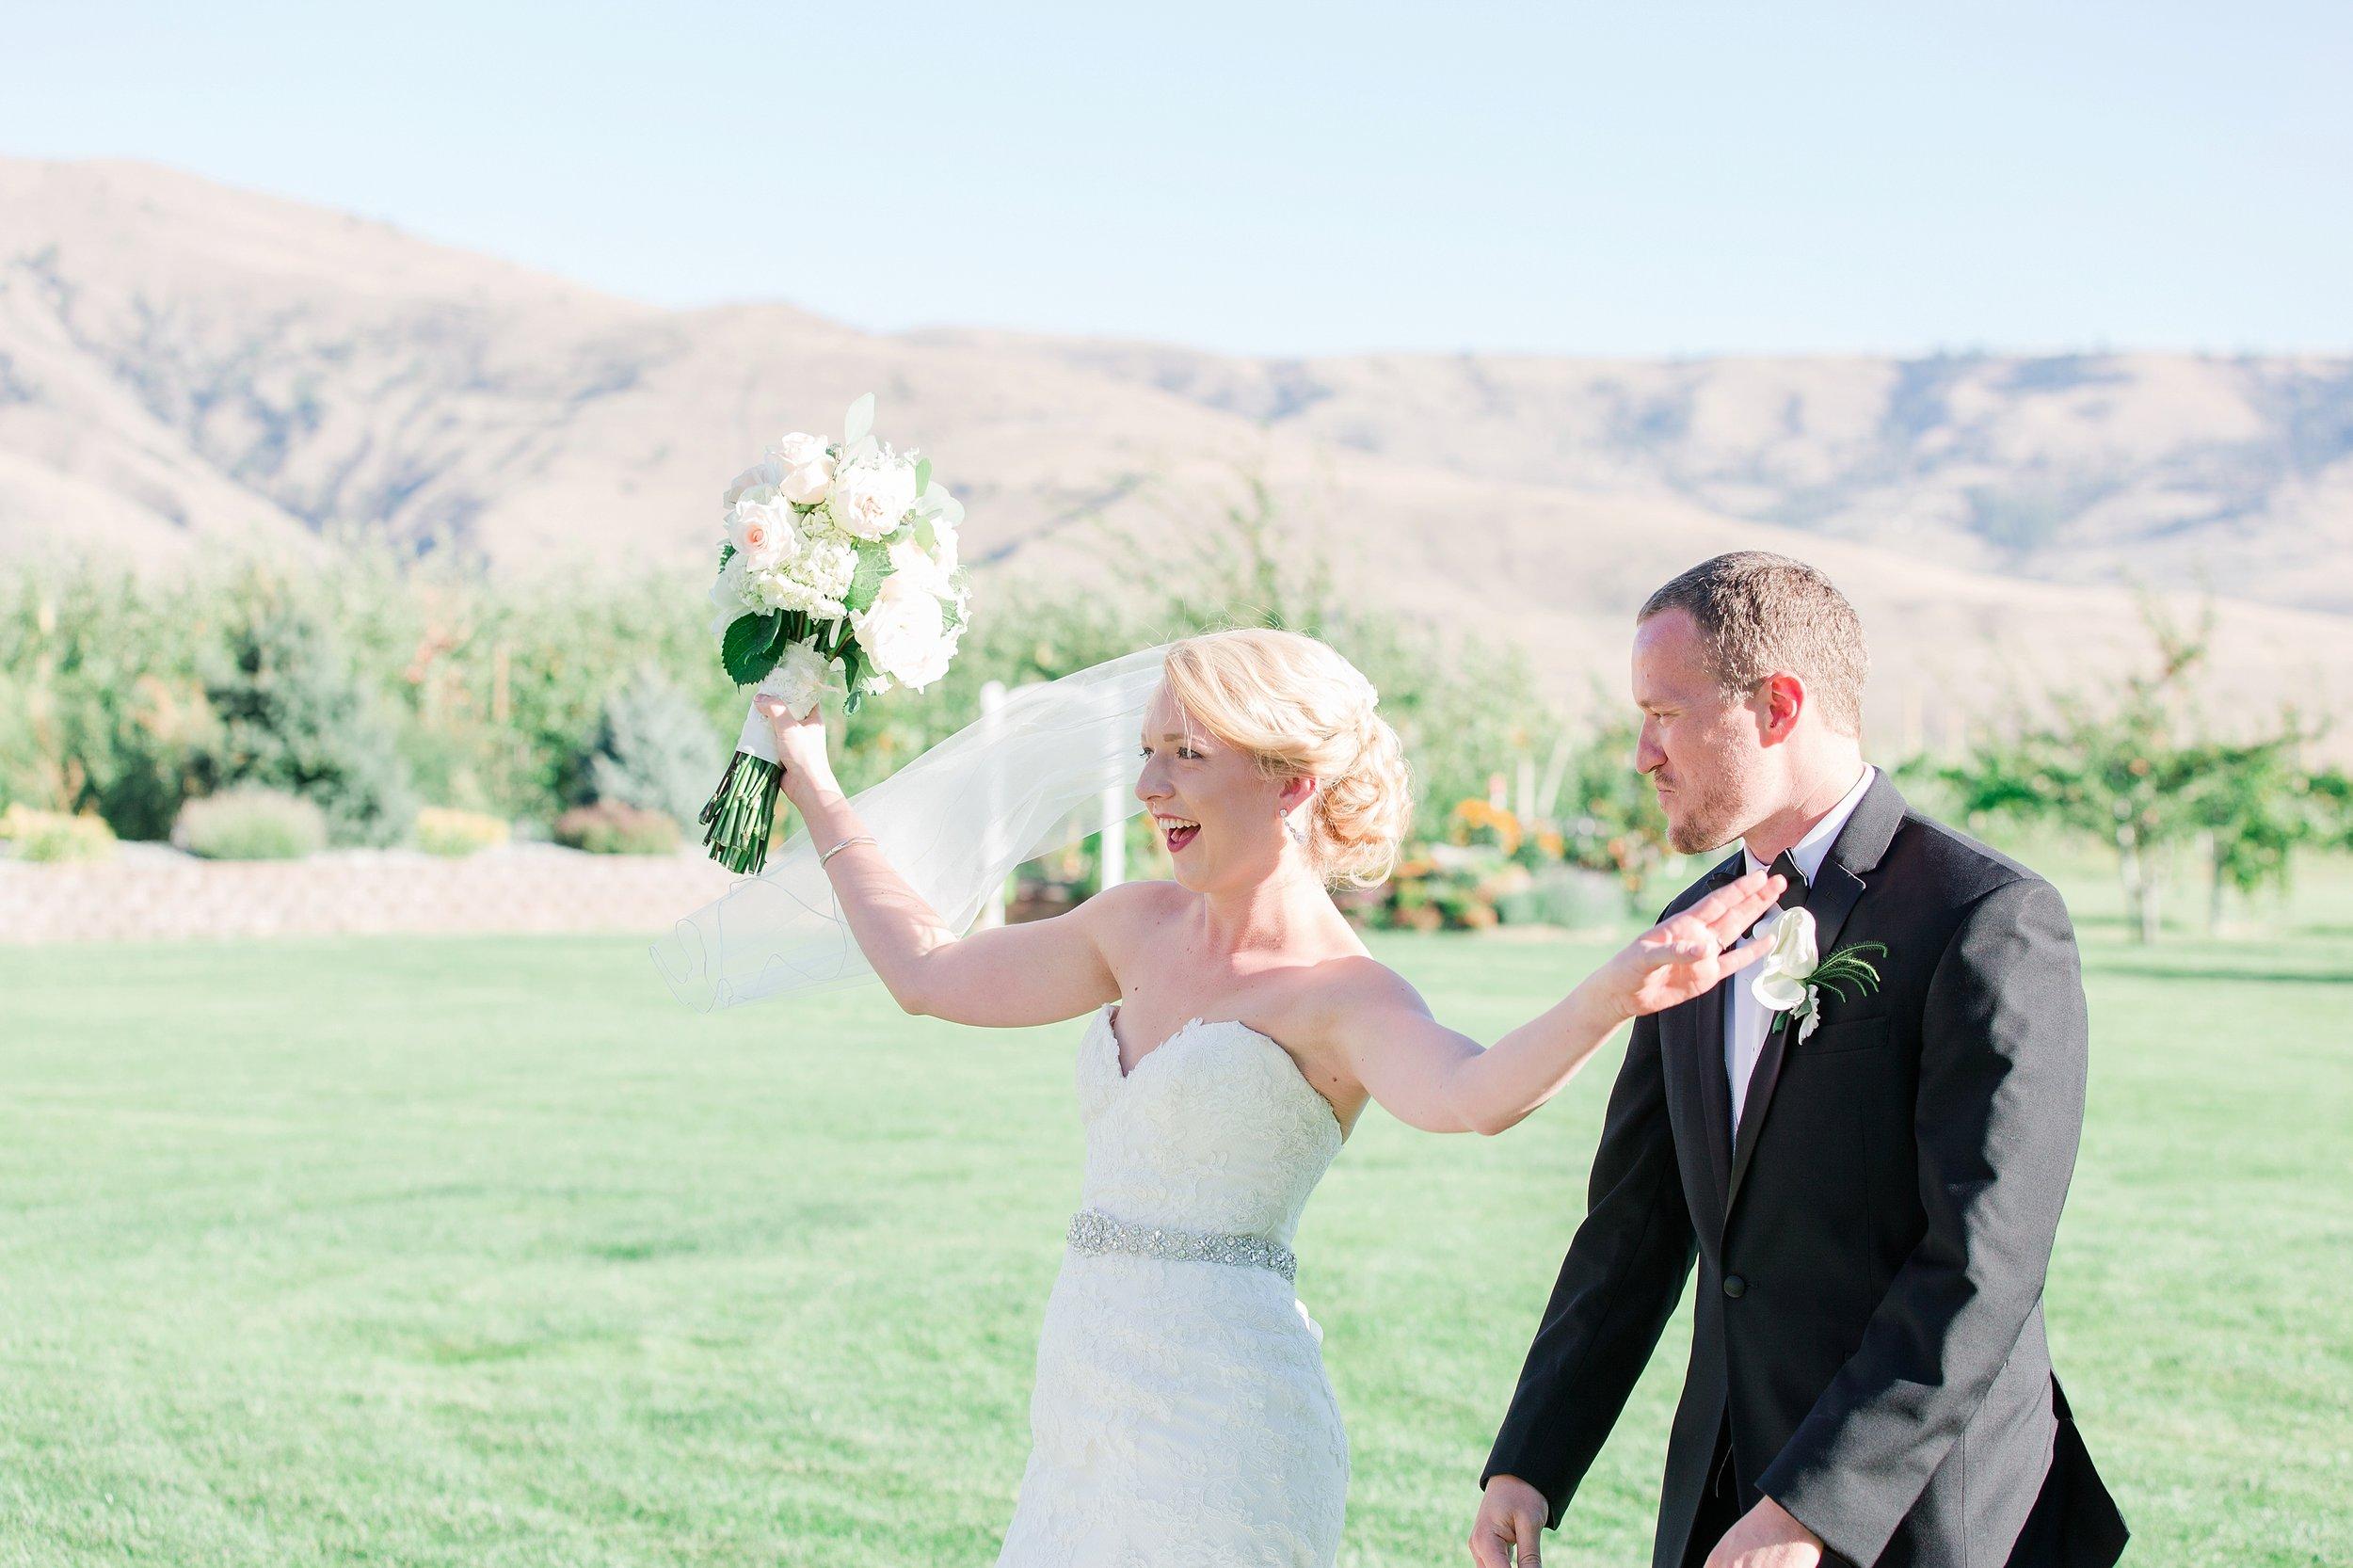 seattle wedding photographer_0310.jpg